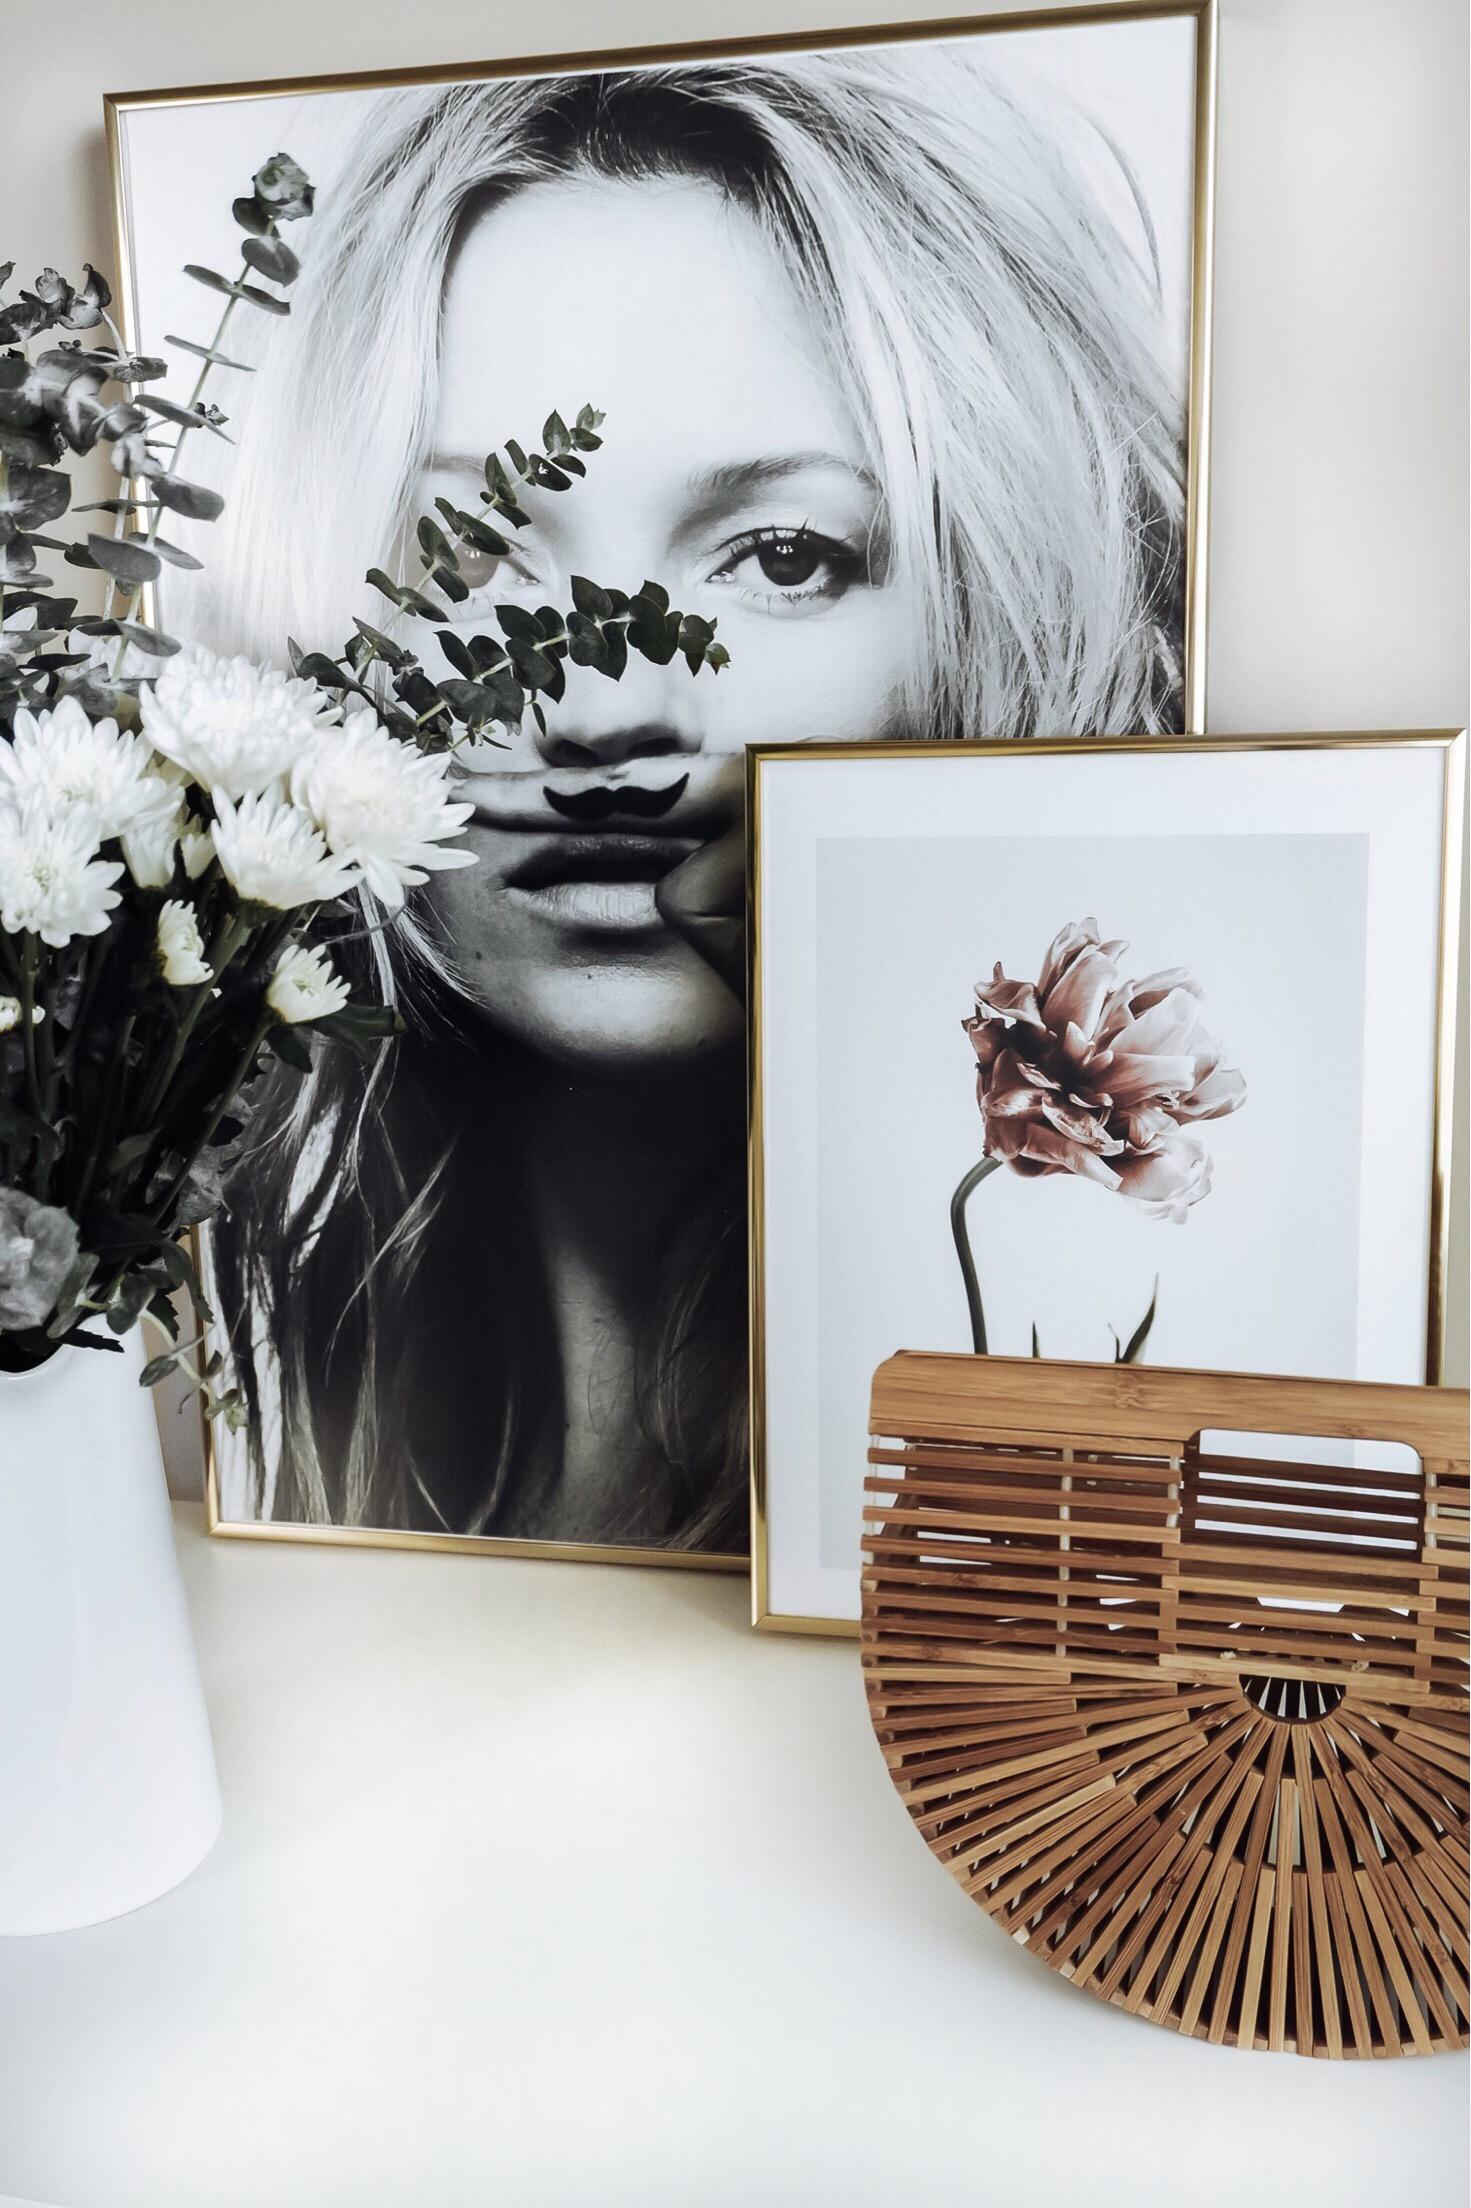 Tiffany Jais Houston fashion and lifestyle blogger | Friday feels | Deseno art prints Kate Moss, Life is a joke print | Scandinavian interiors Pink Tulip Print, home decor |